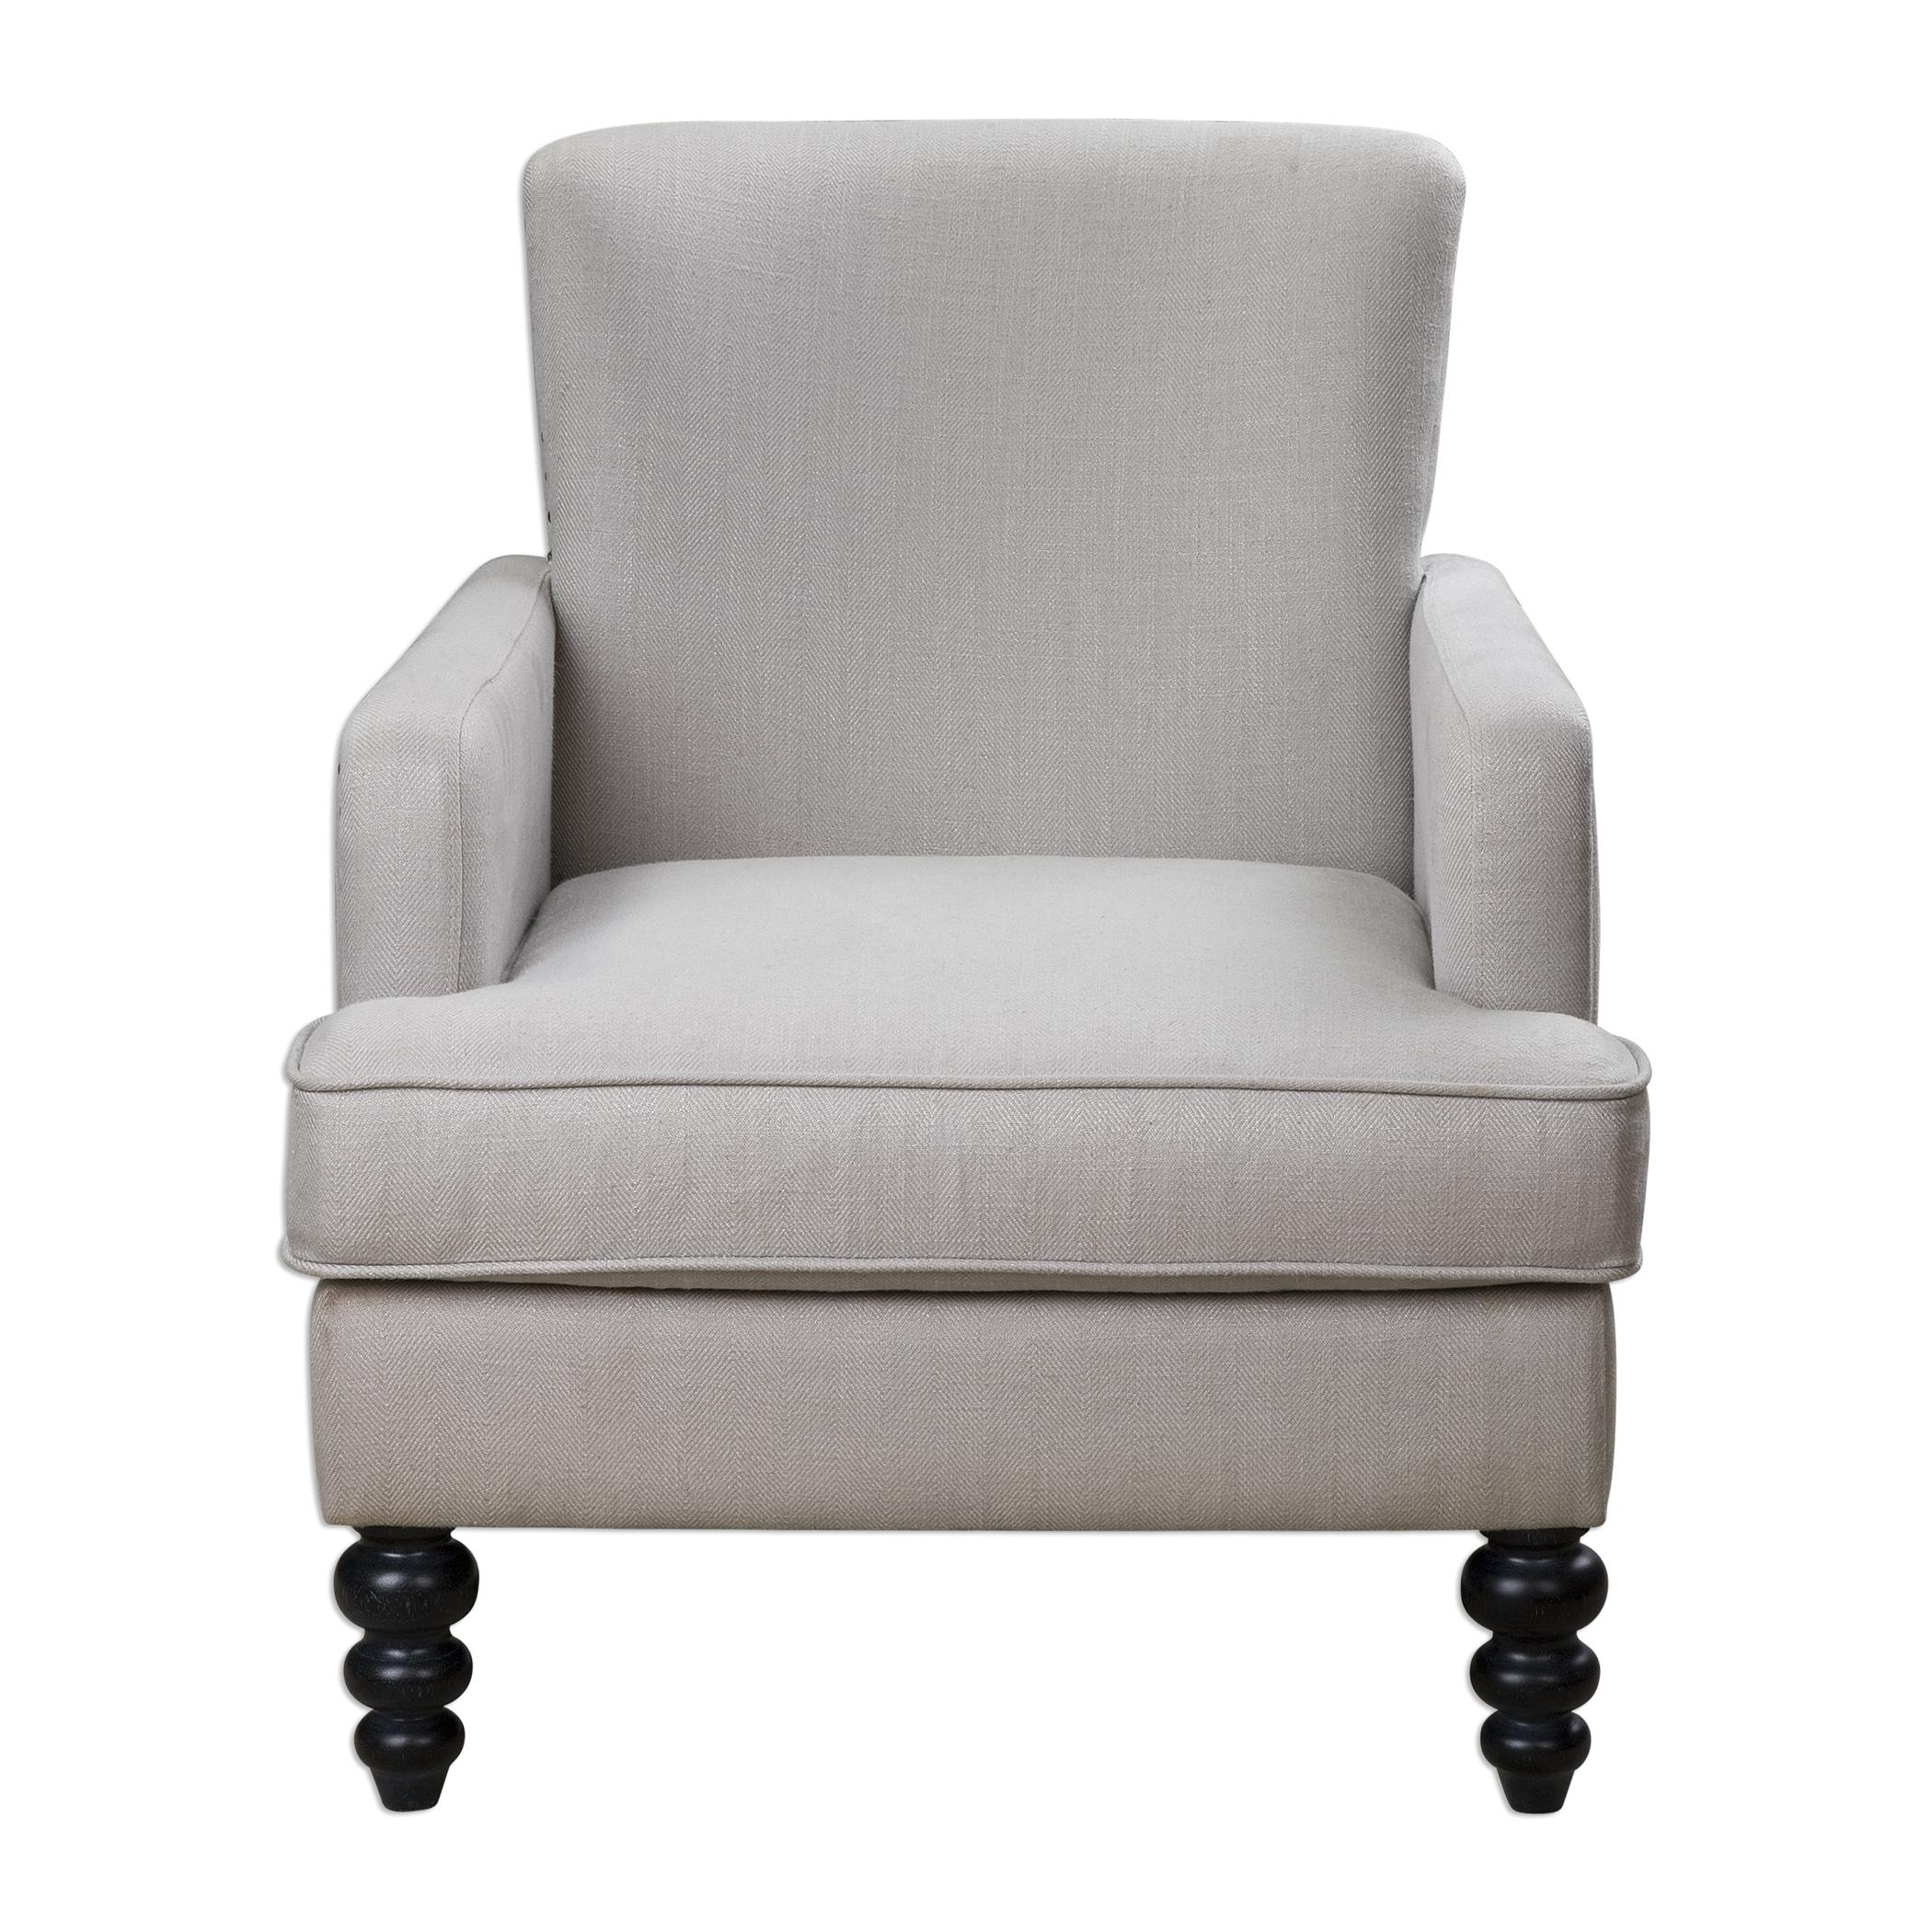 Uttermost Accent Furniture Flannan White Textured Armchair - Item Number: 23289